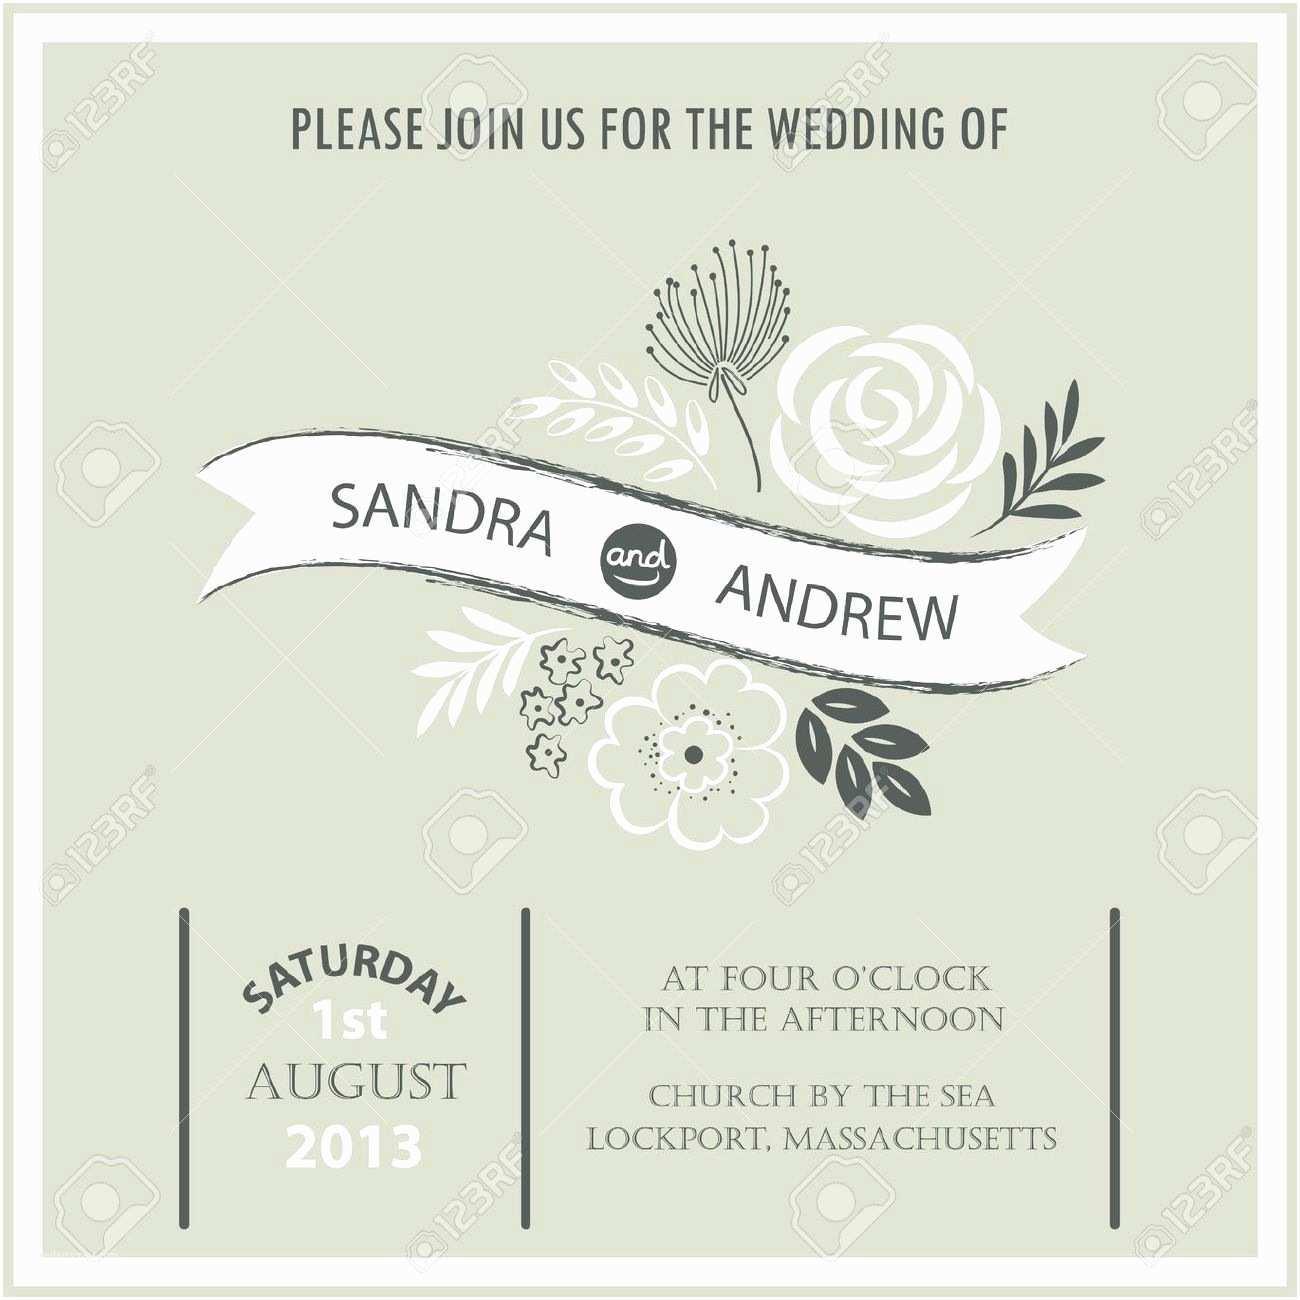 Engraved Wedding Invitations Cost Inspirational Wedding Invitation